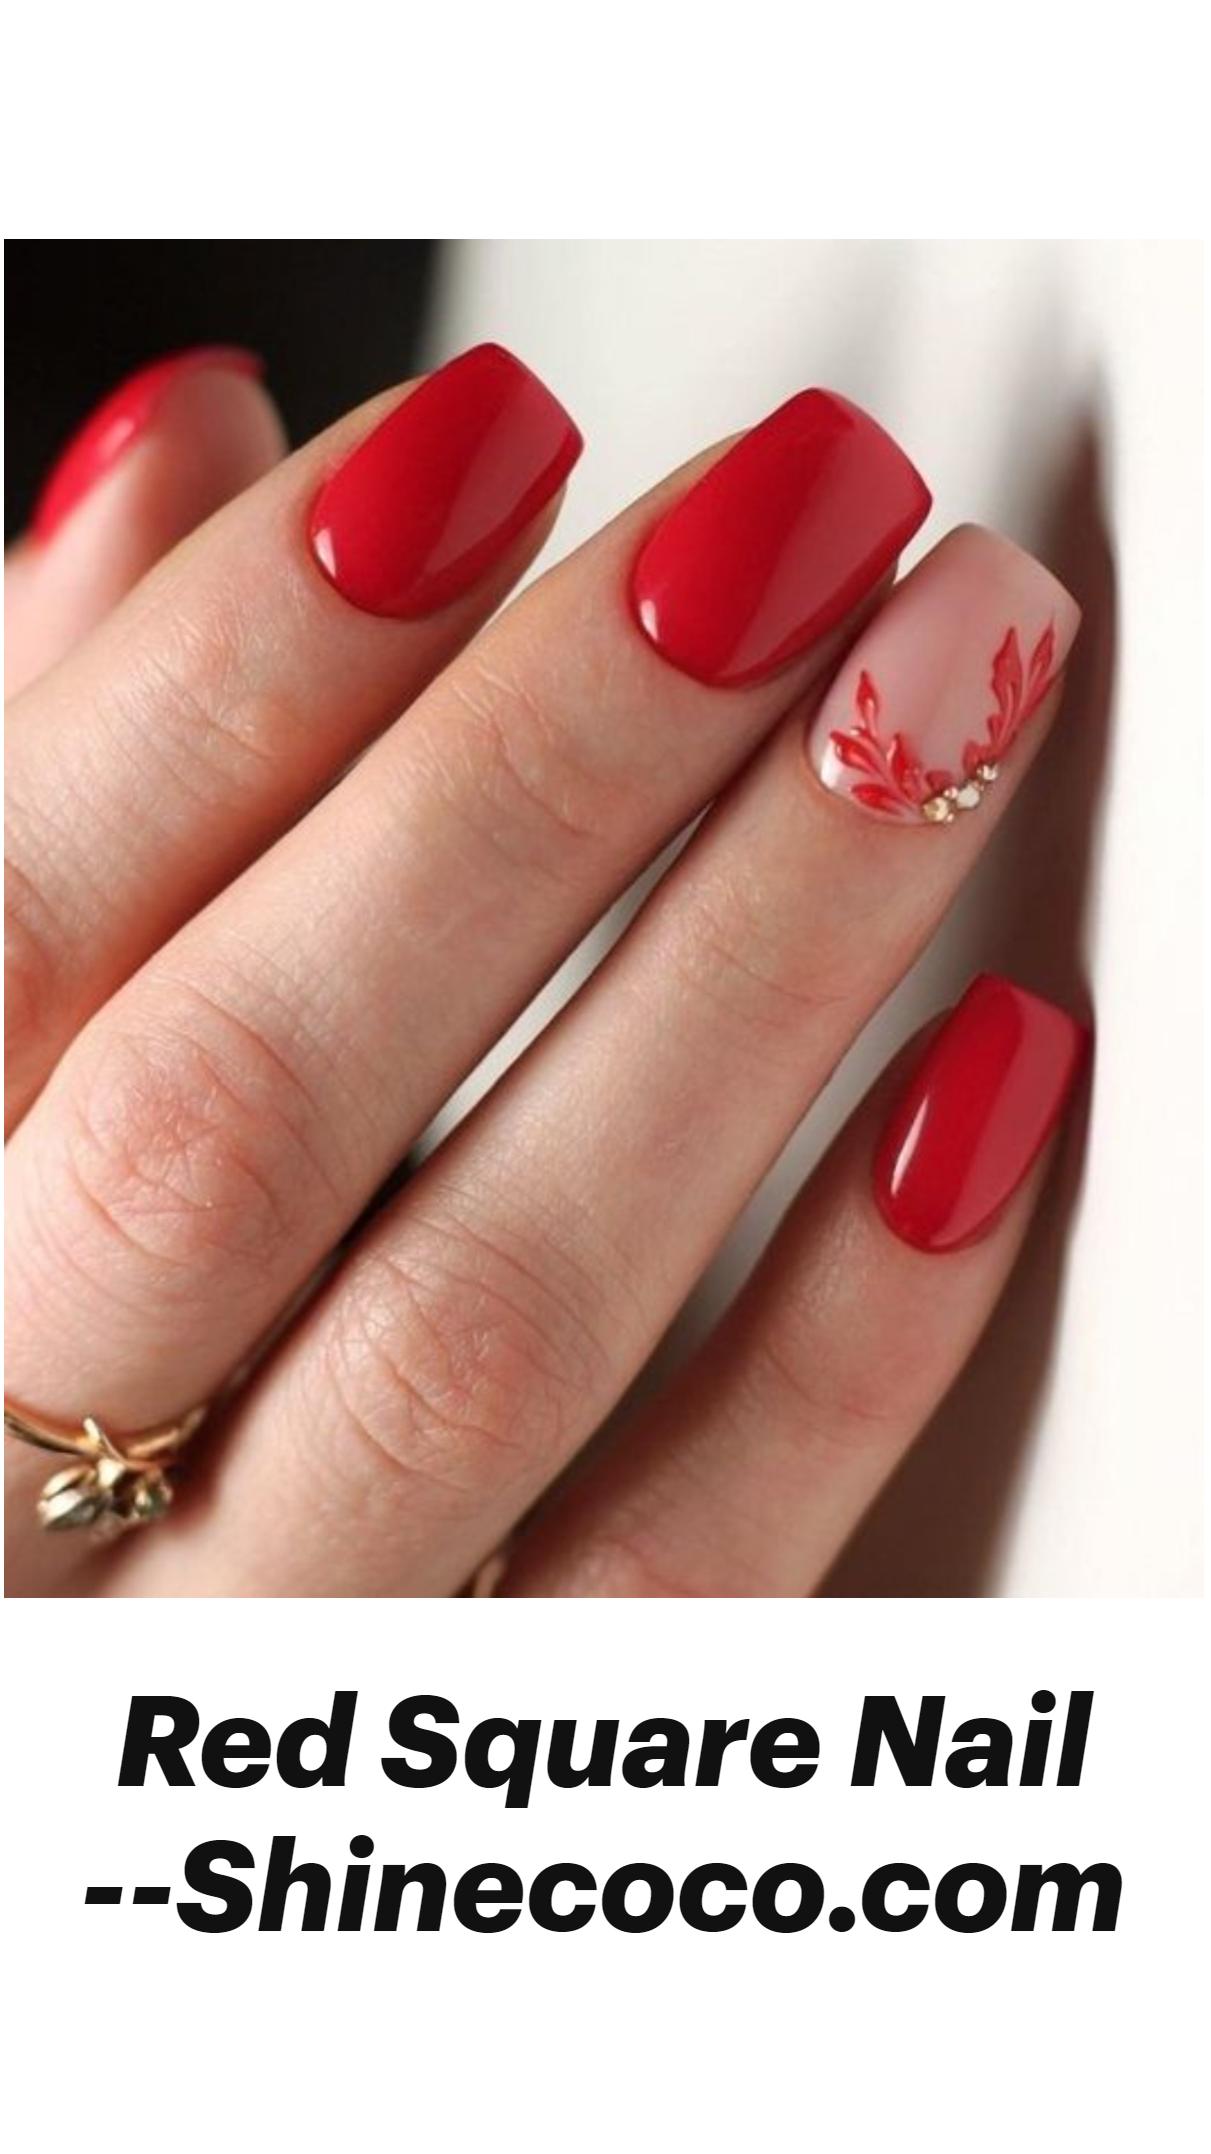 Red Square Nail --Shinecoco.com